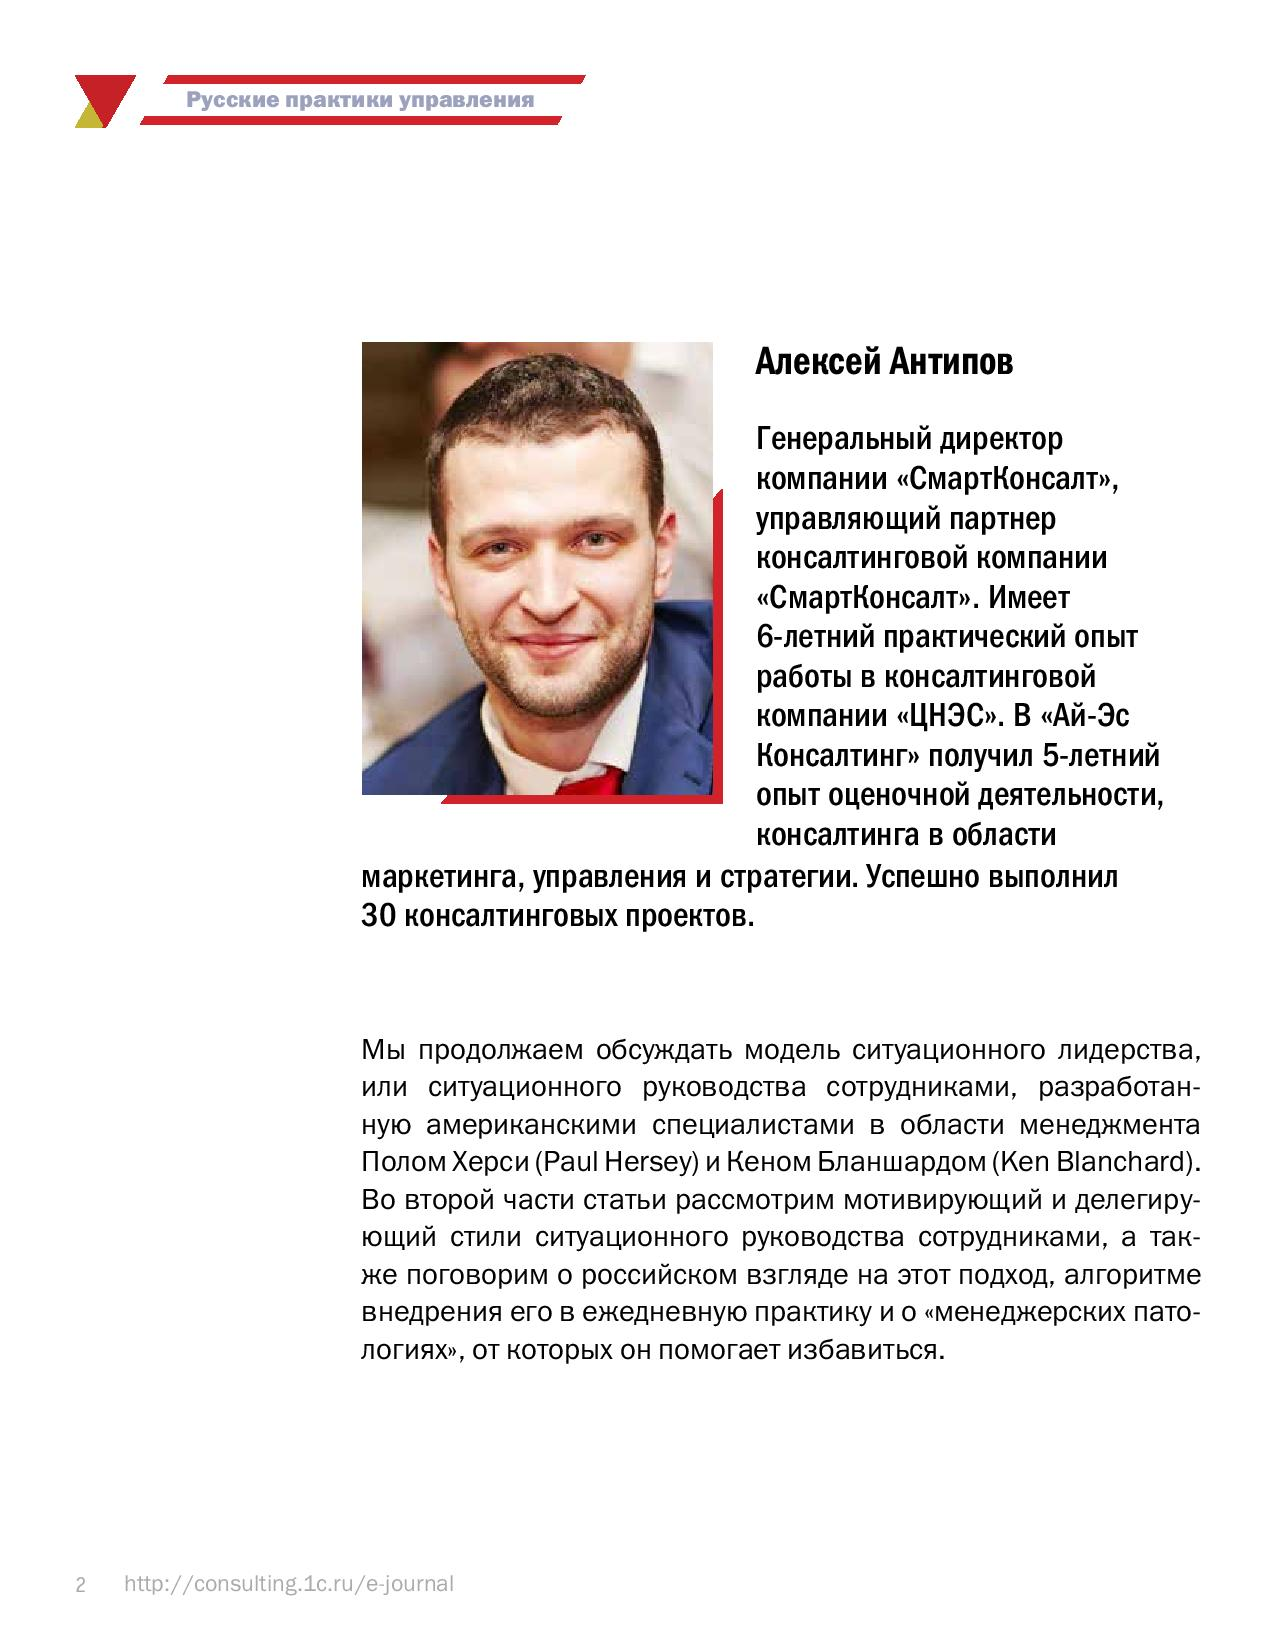 Situacionnyy_podhod_Cast__2._Upravlaem_predpriatiem__04_2015-page-002